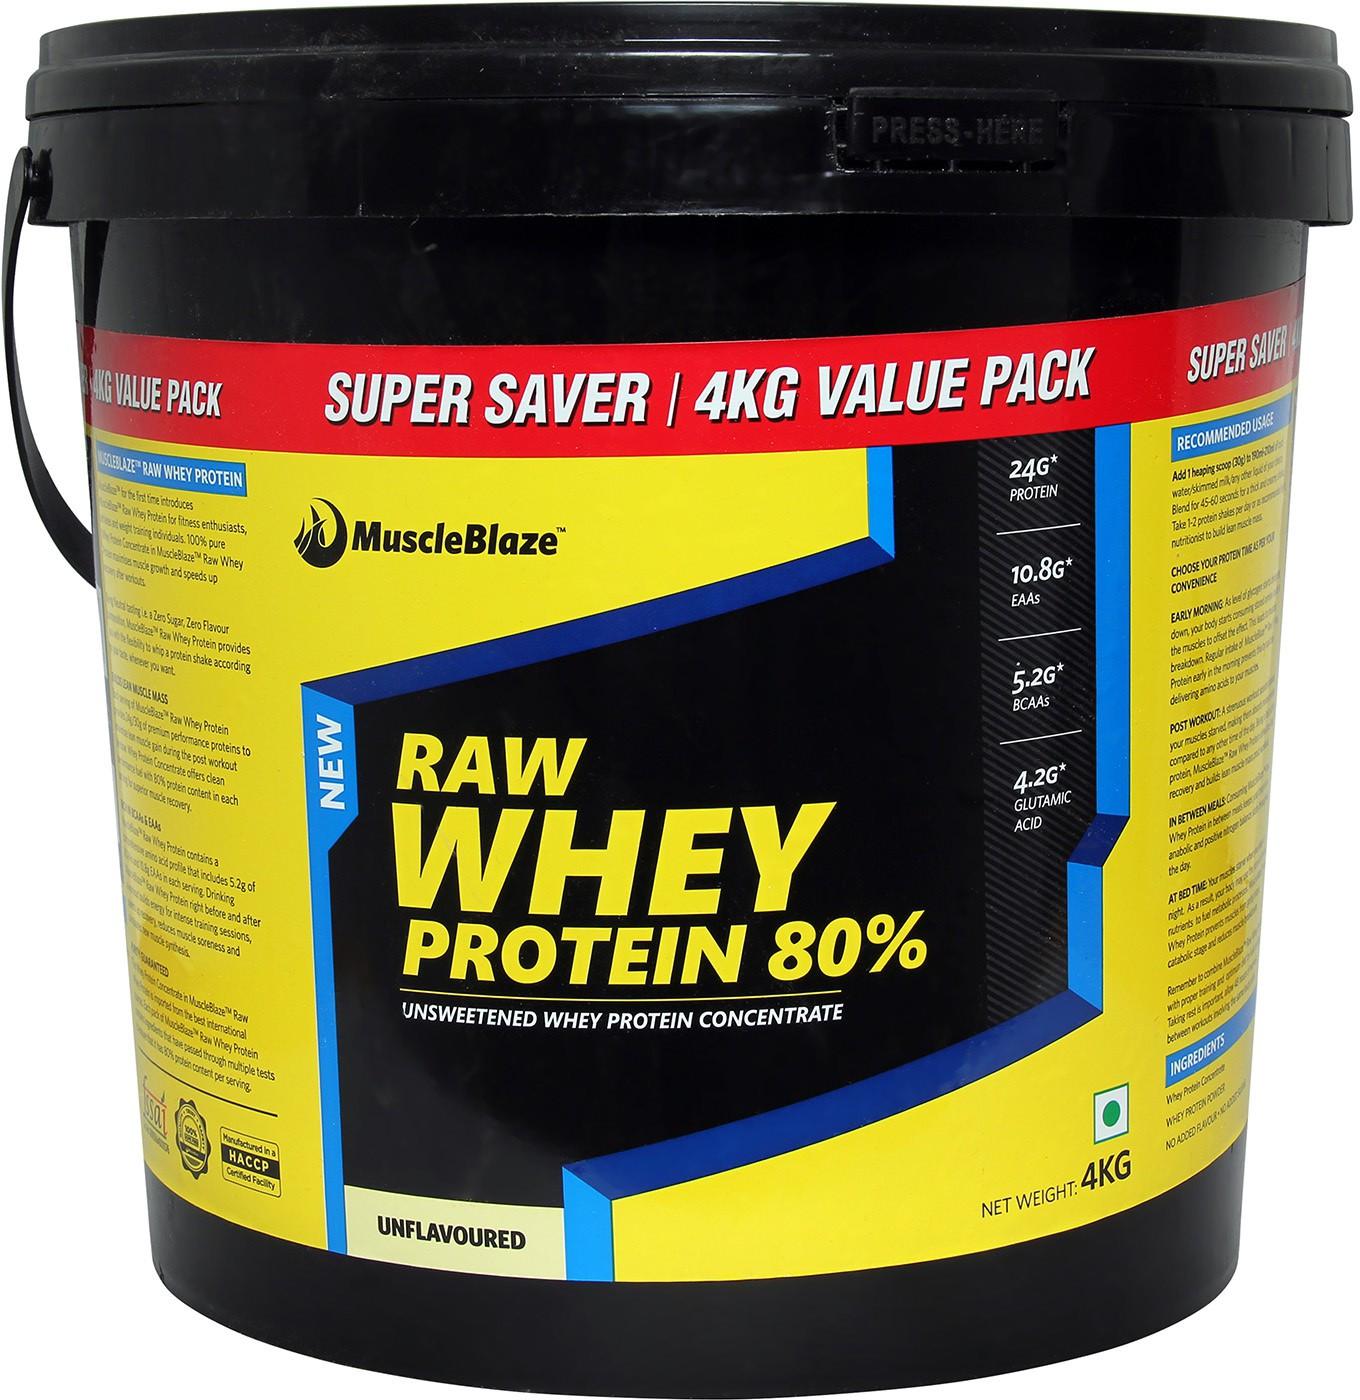 MuscleBlaze Raw Whey Protein4 kg Unflavoured